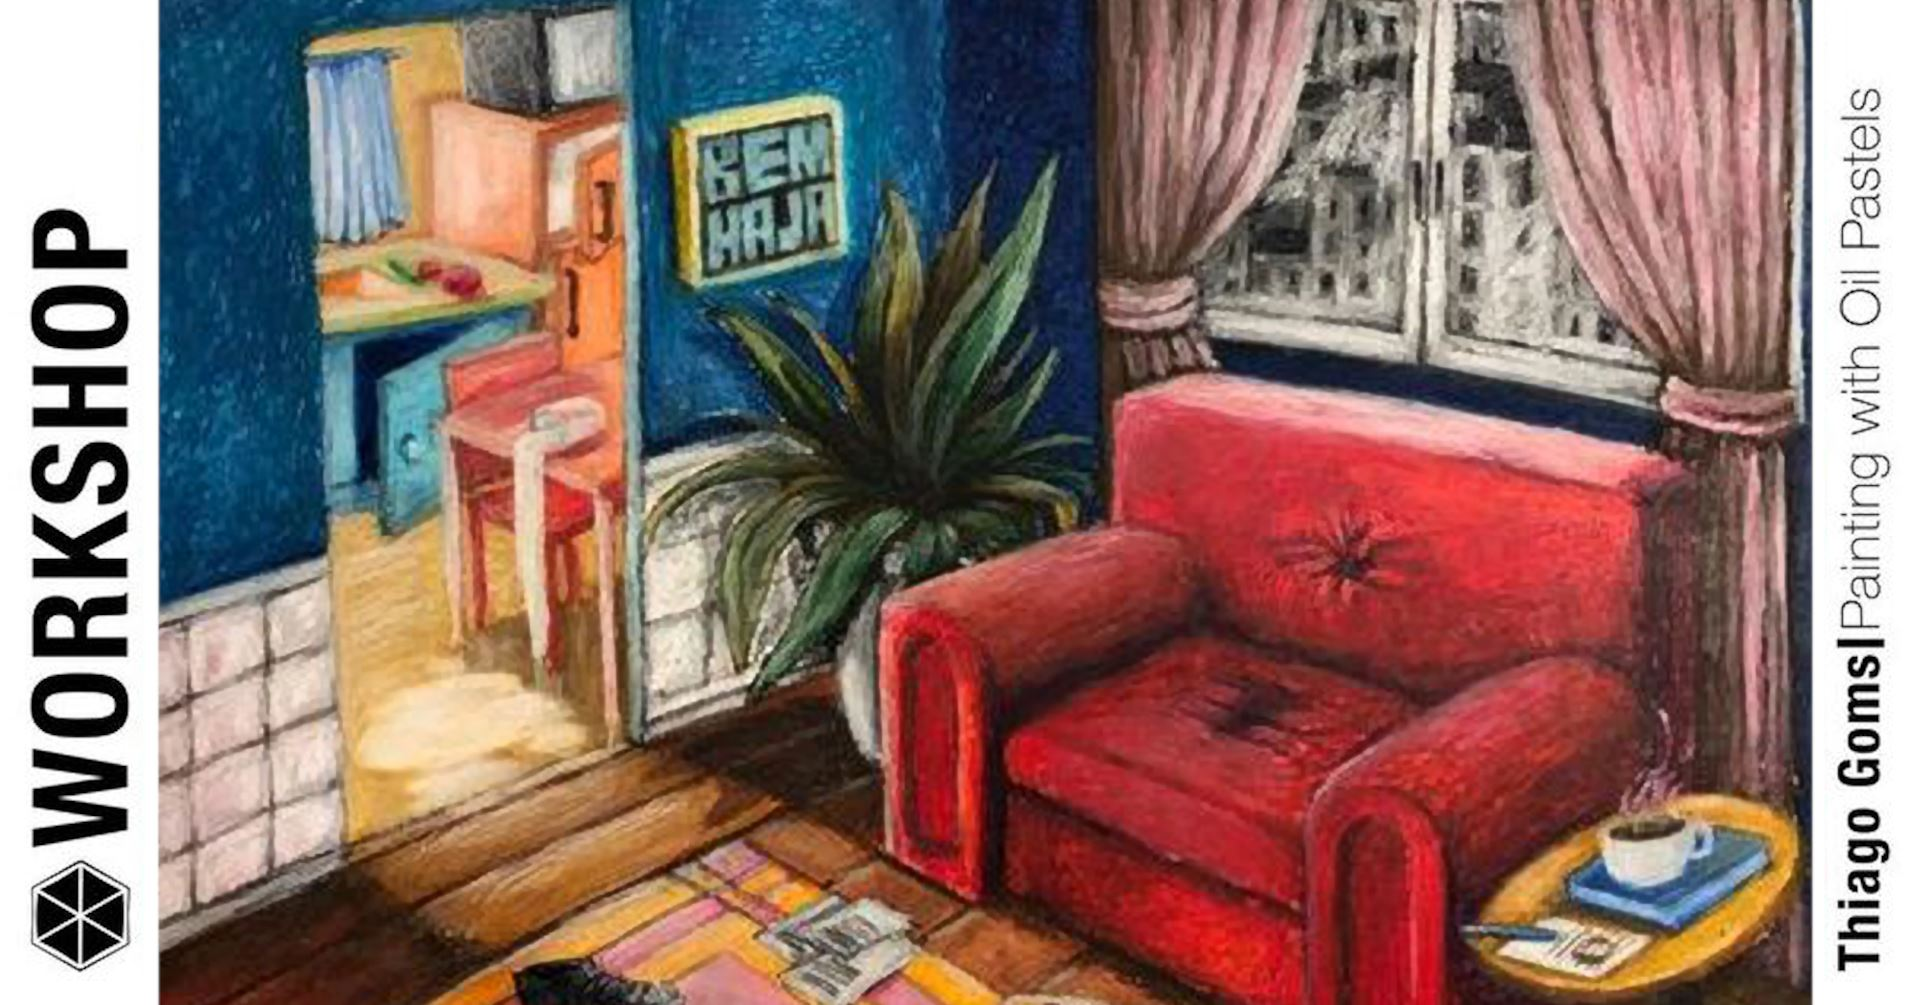 Workshop Pintura - Pastel Oleo com Thiago Goms